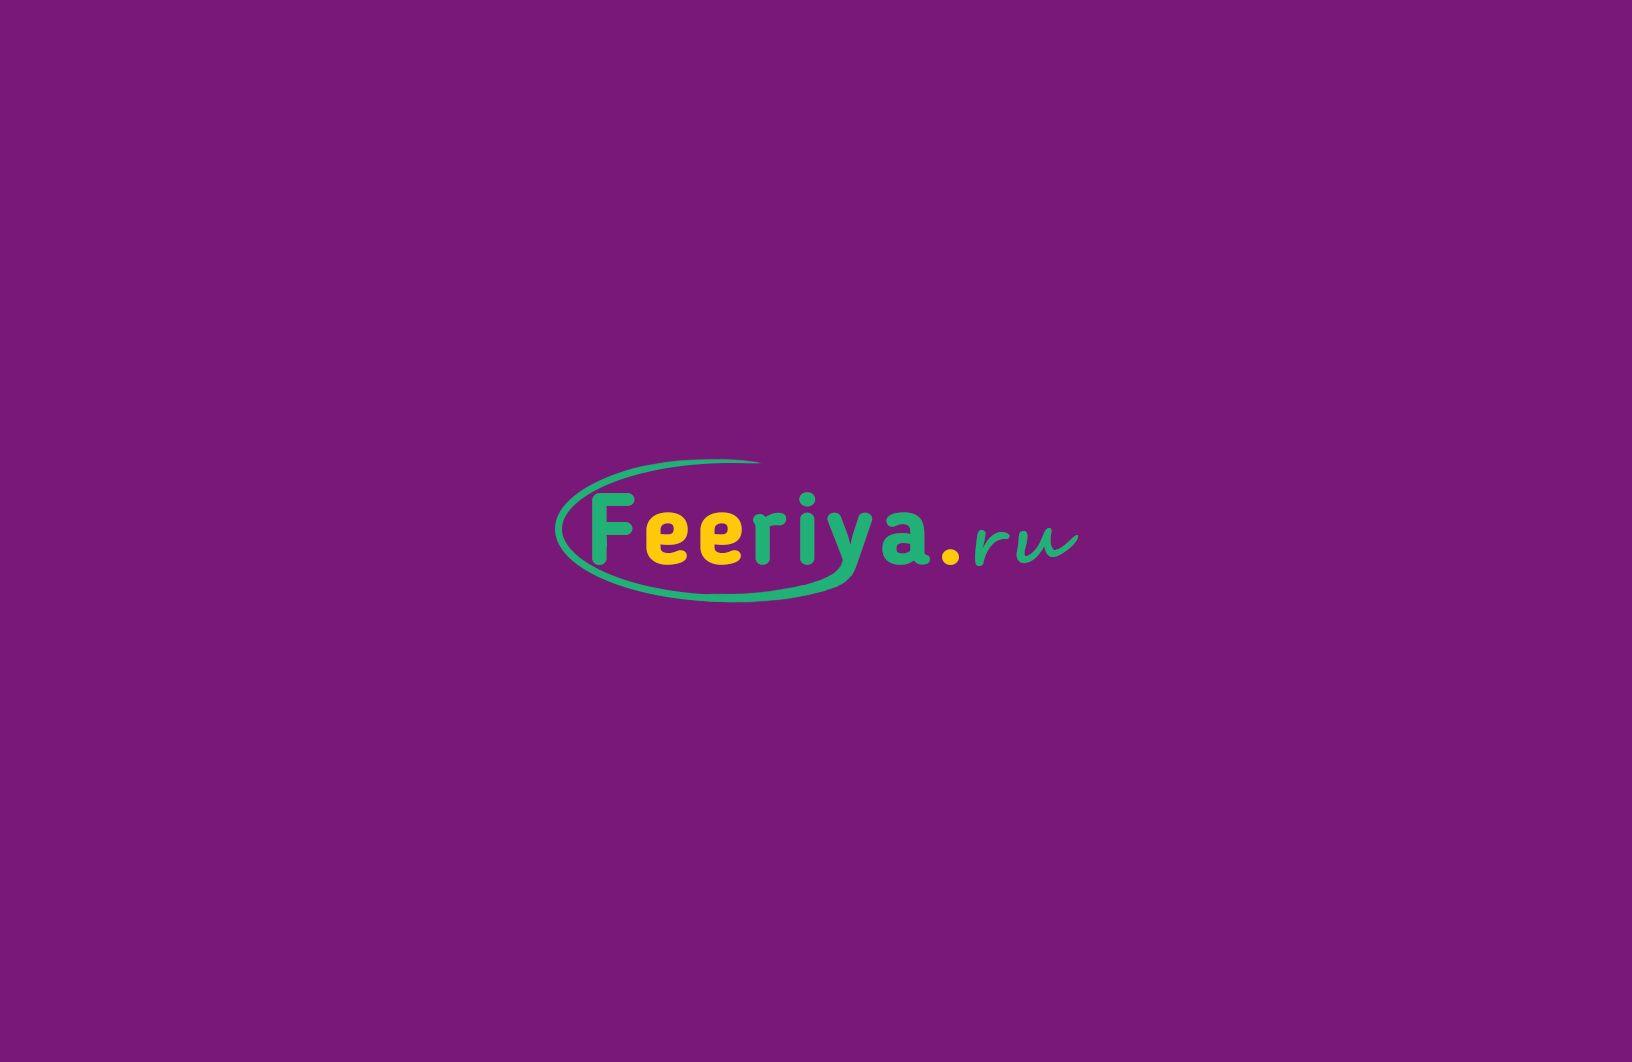 Логотип для feeriya.ru - дизайнер Evgen_SV